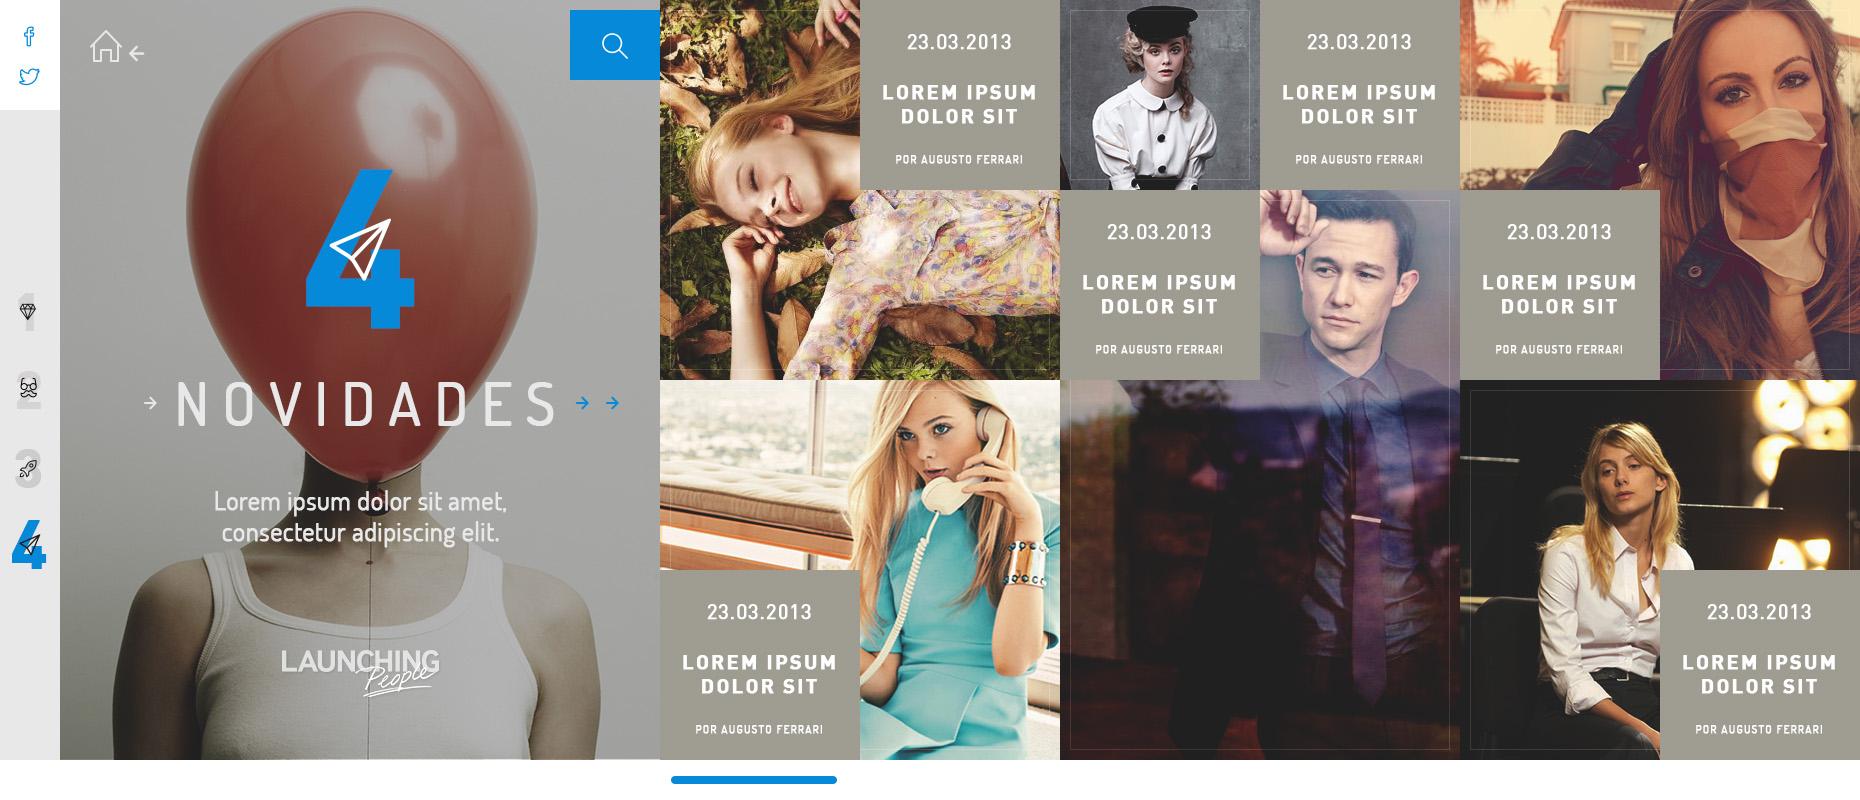 4_Launching People - Novidades-Home.jpg